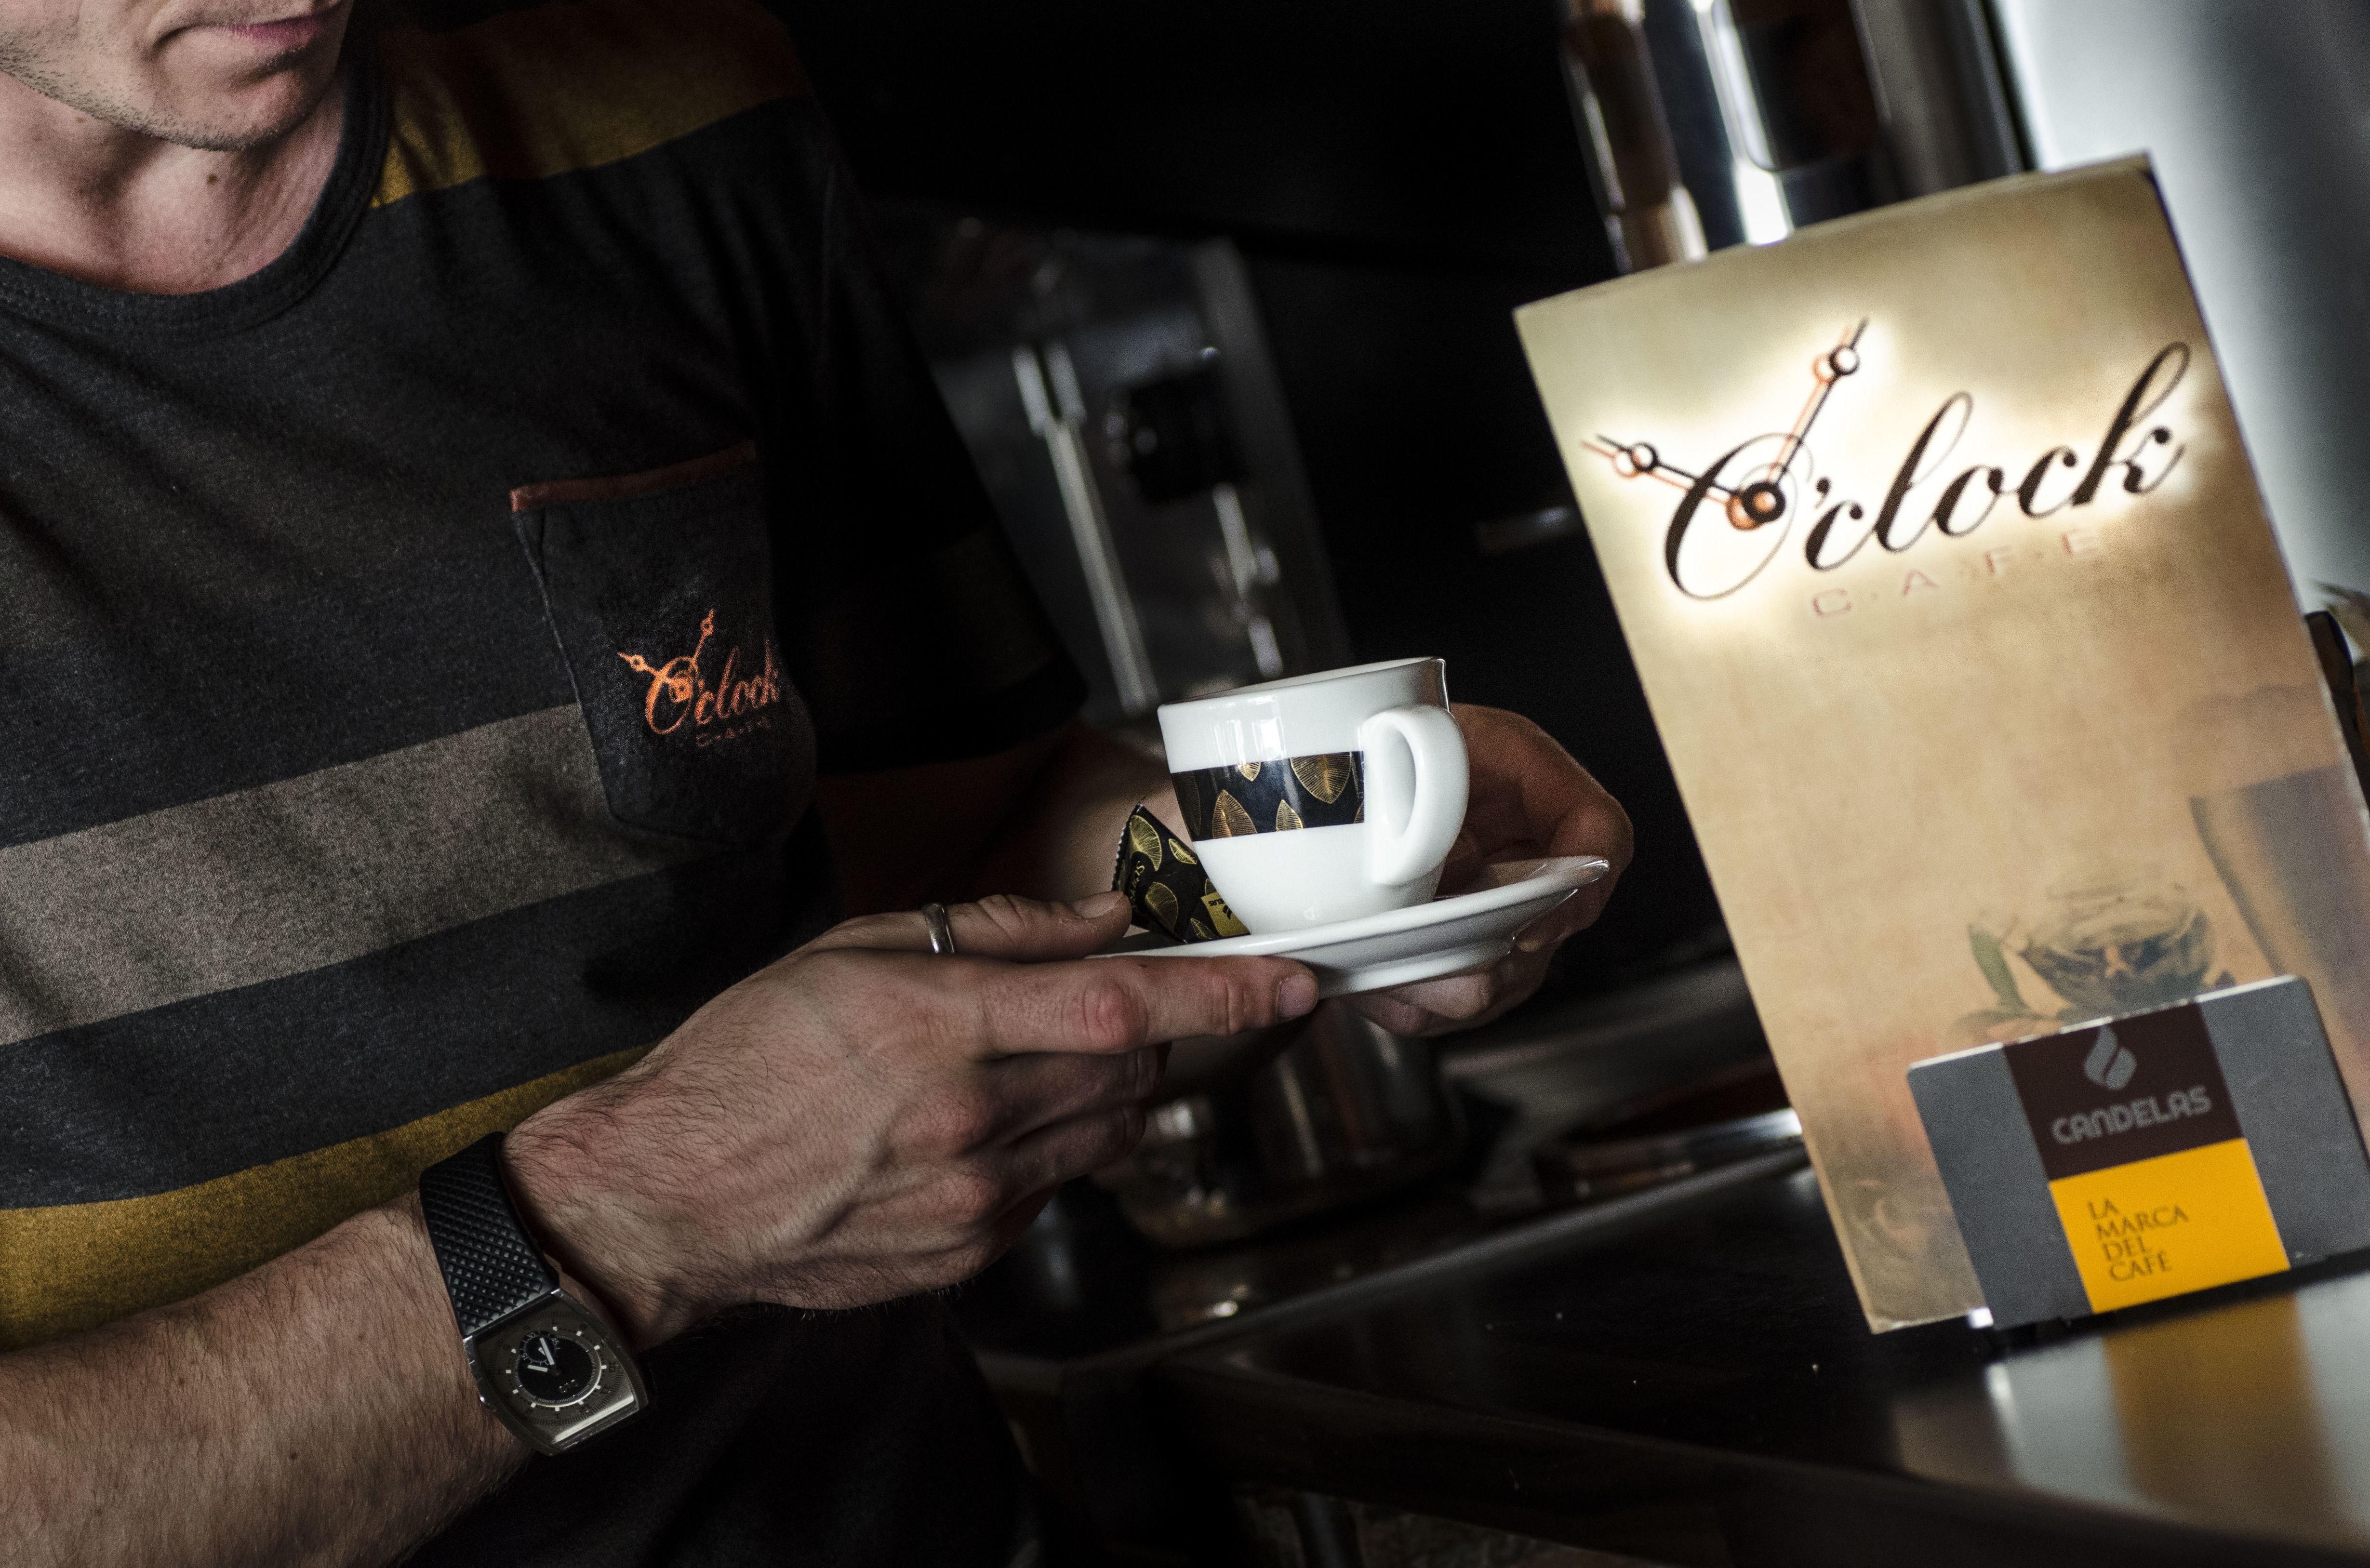 Foto 33 de Restaurante en Valencia   Cafetería Tosteria O´Clock